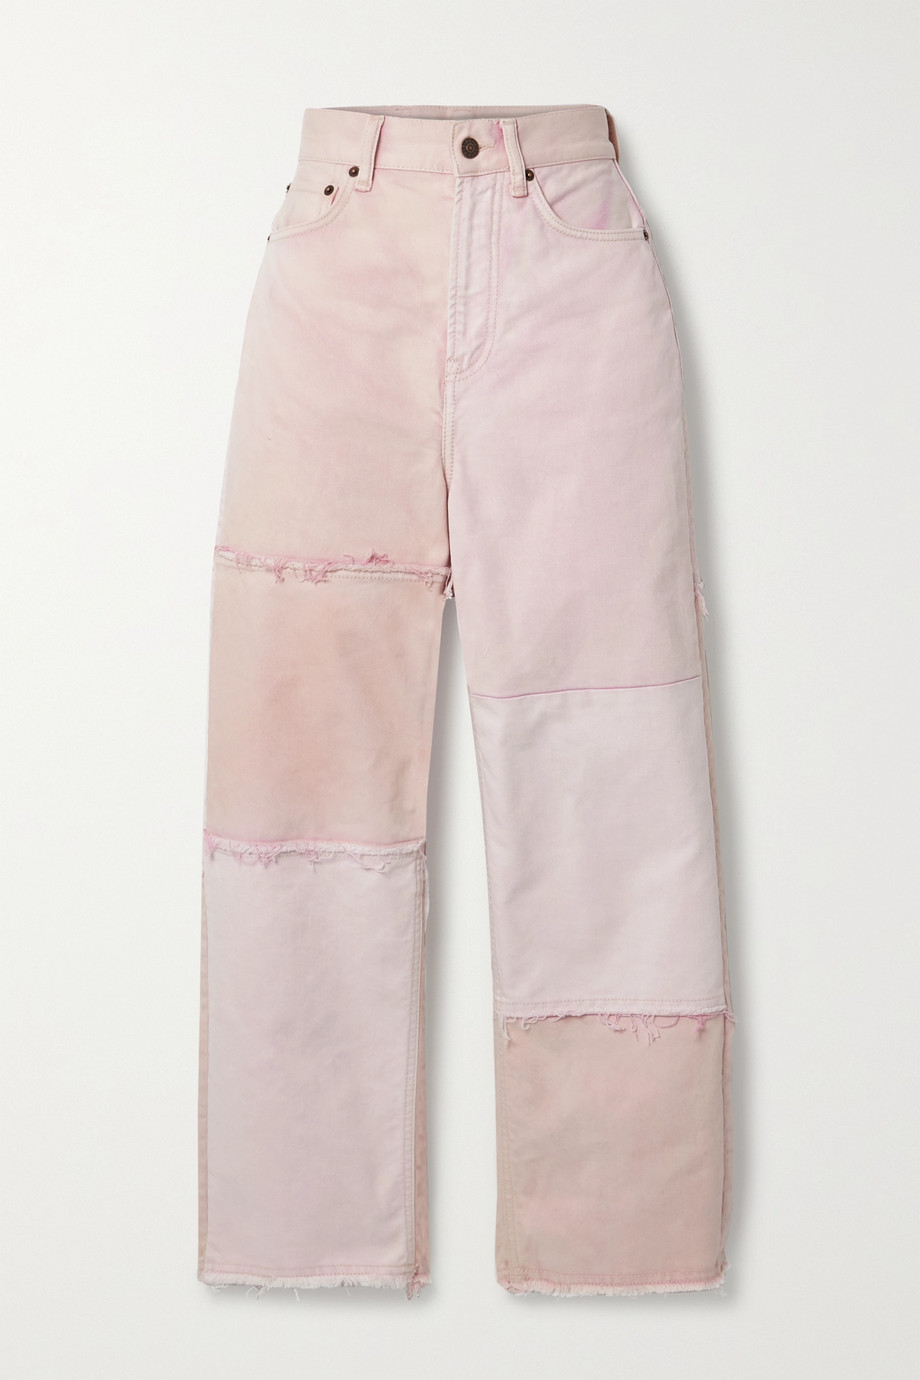 Acne Studios 【NET SUSTAIN】1993 毛边拼缝高腰直筒有机牛仔裤